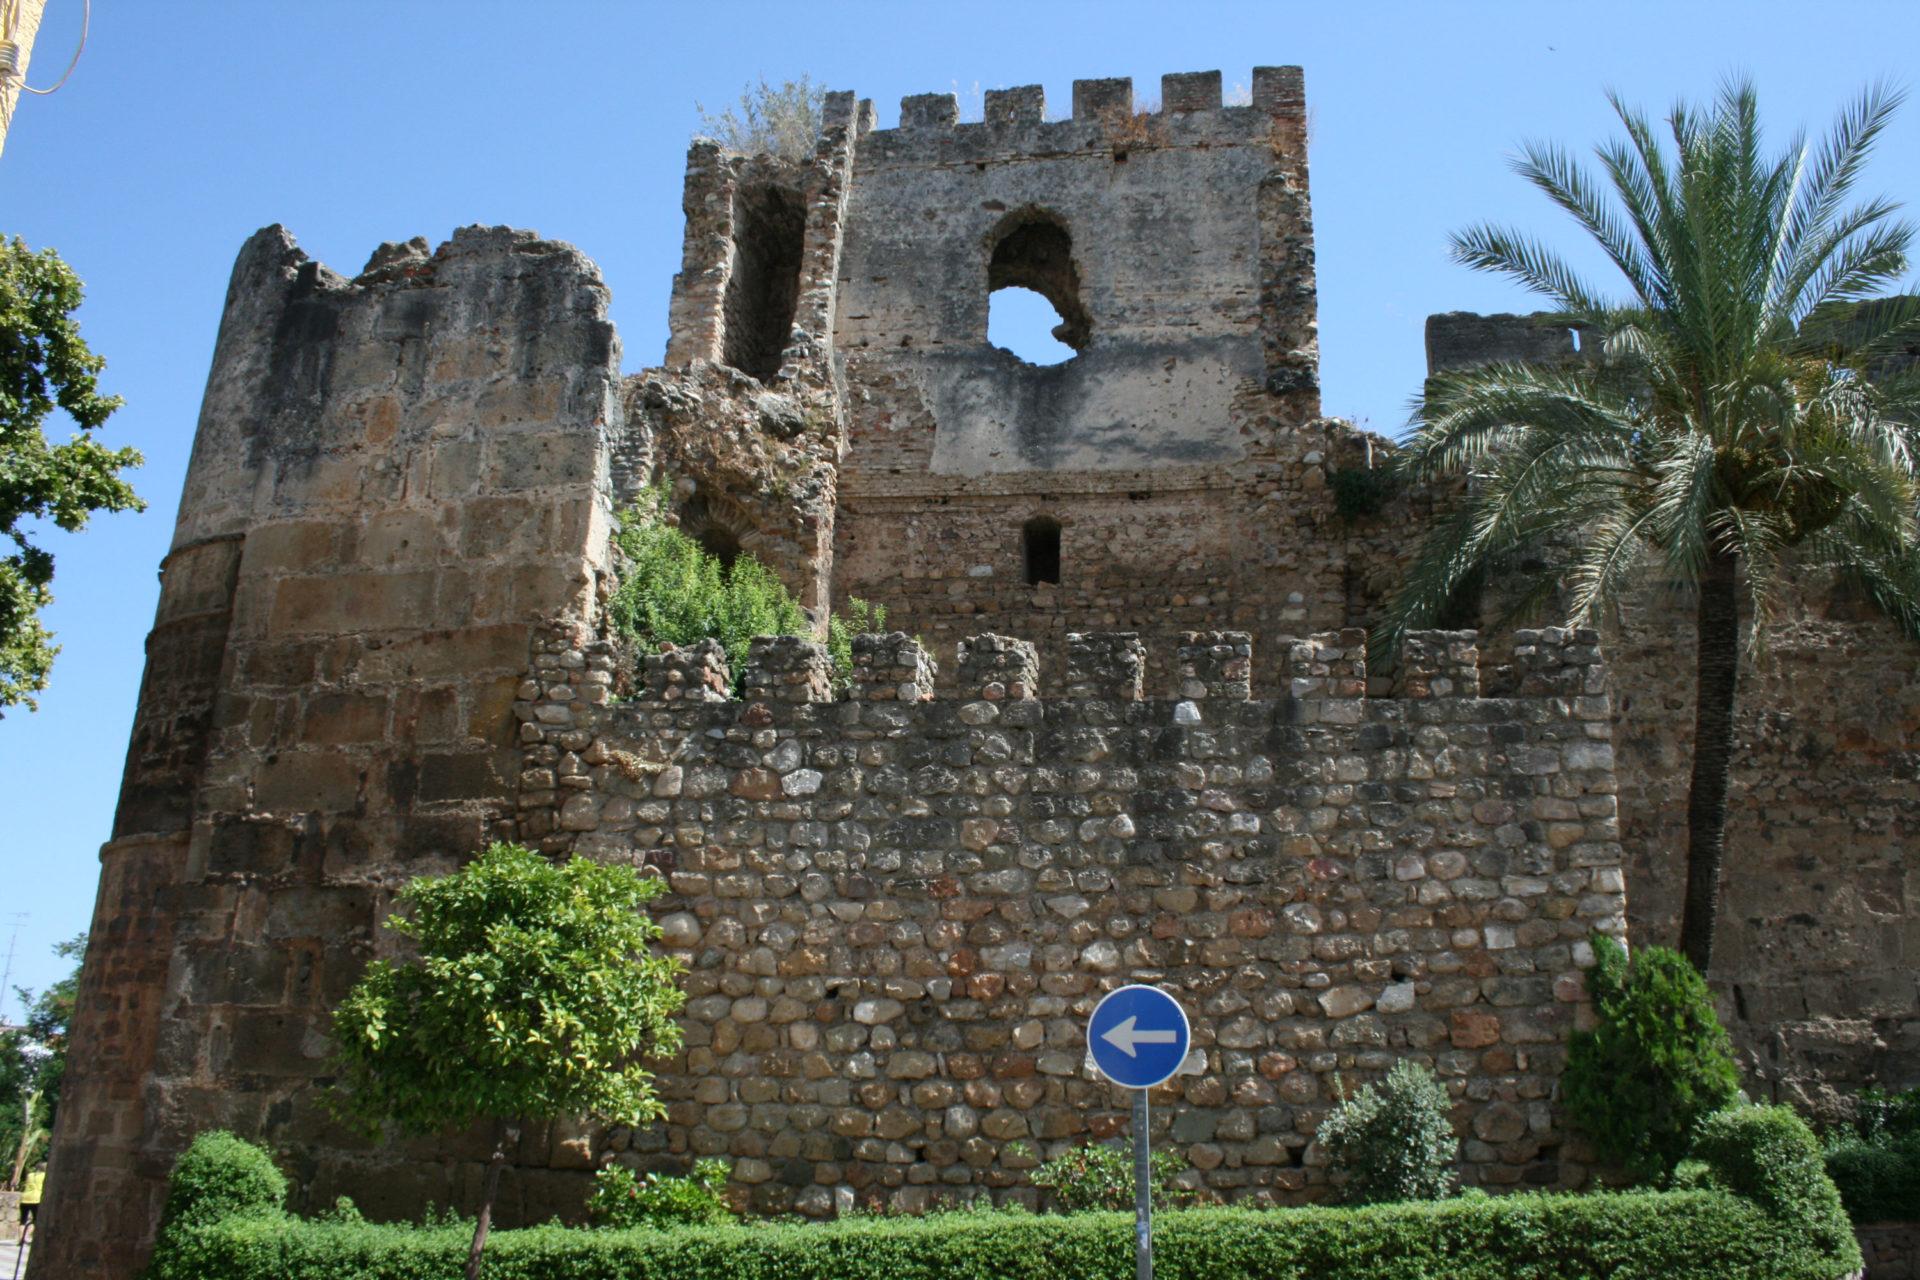 Moorish Castle Marbella